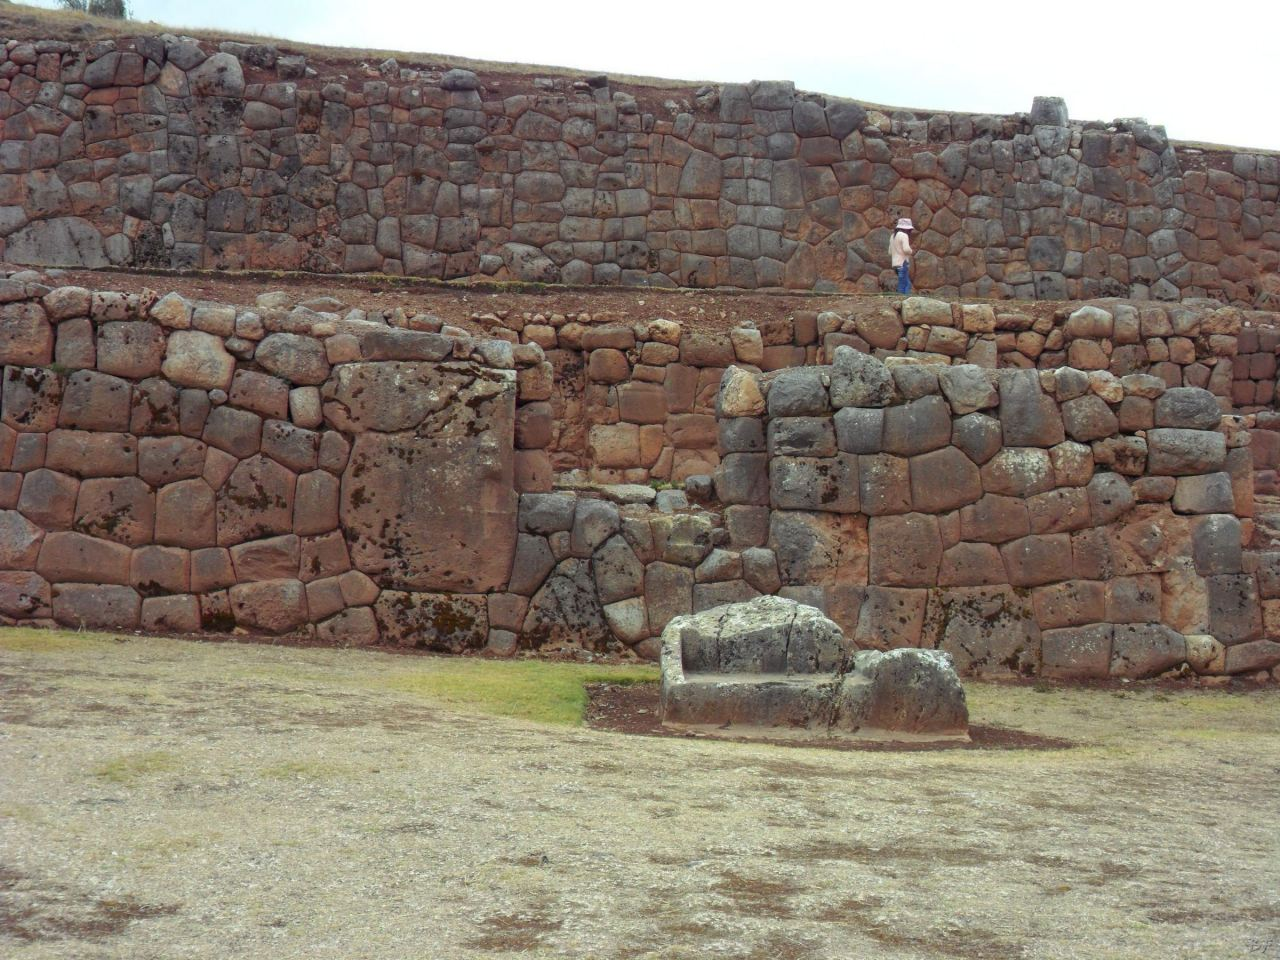 Chinchero-Mura-Poligonali-Piramide-Urubamba-Peru-35